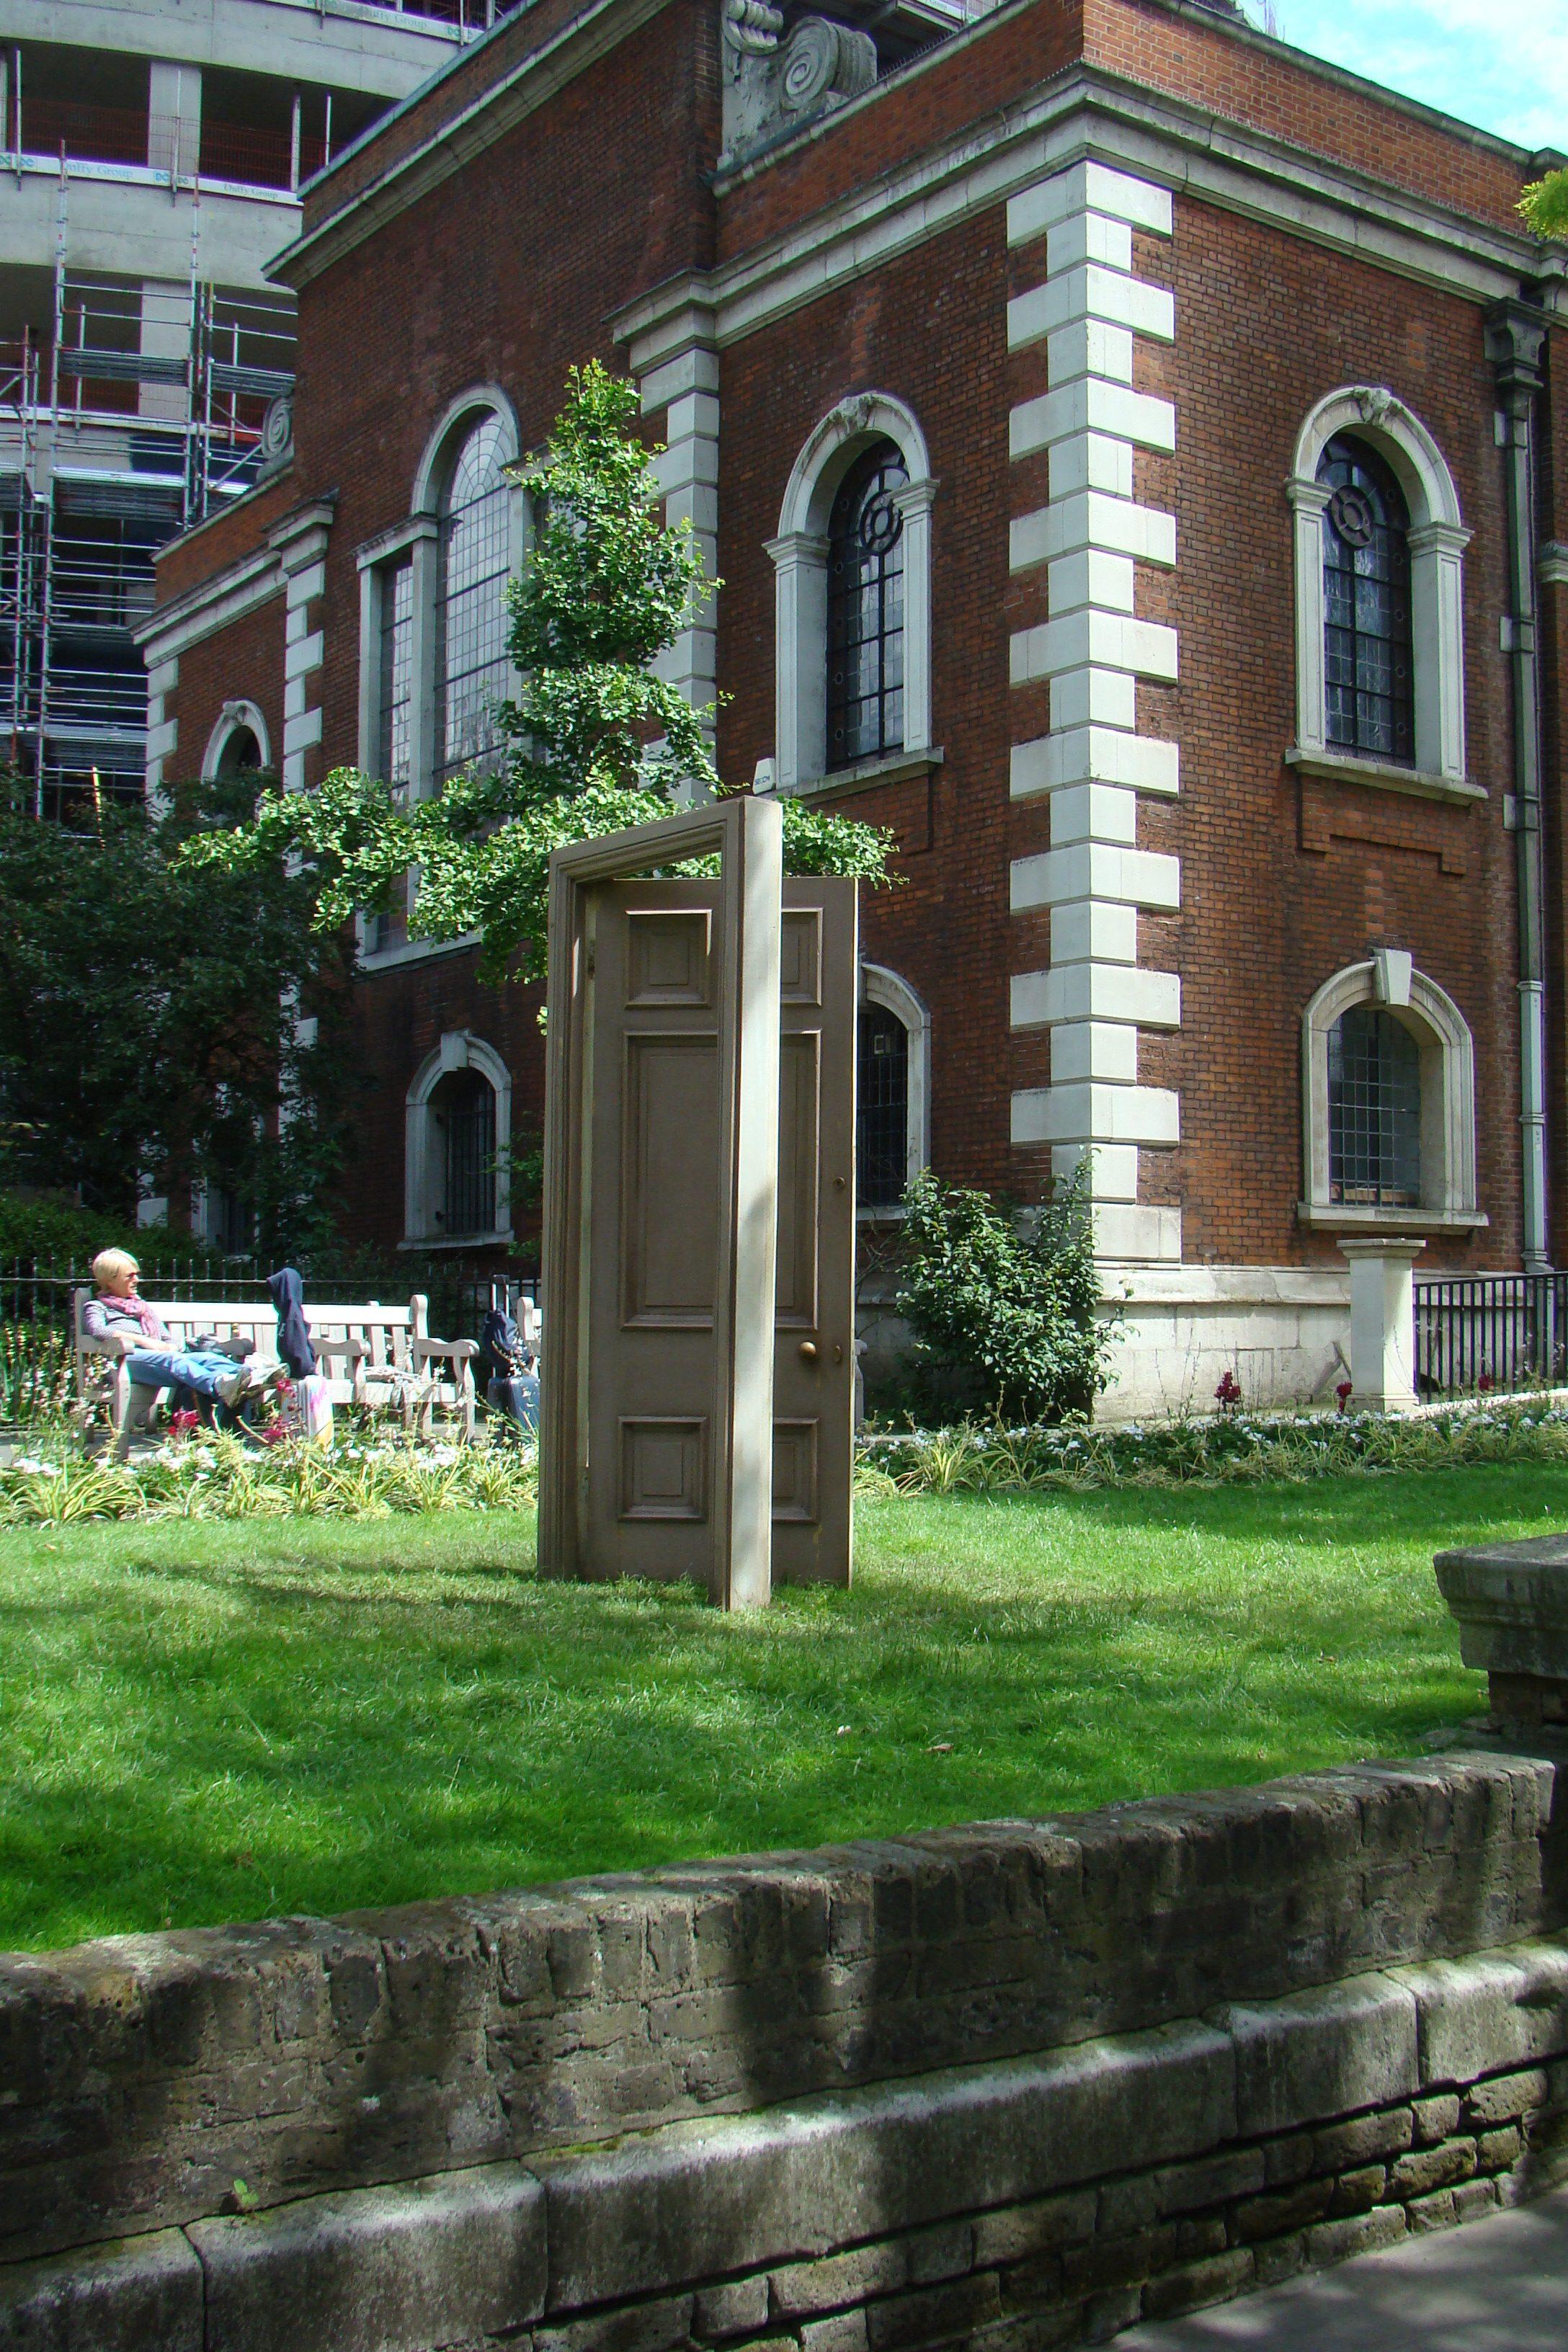 Sculpture in the City 2016, Londra - Gavin Turk